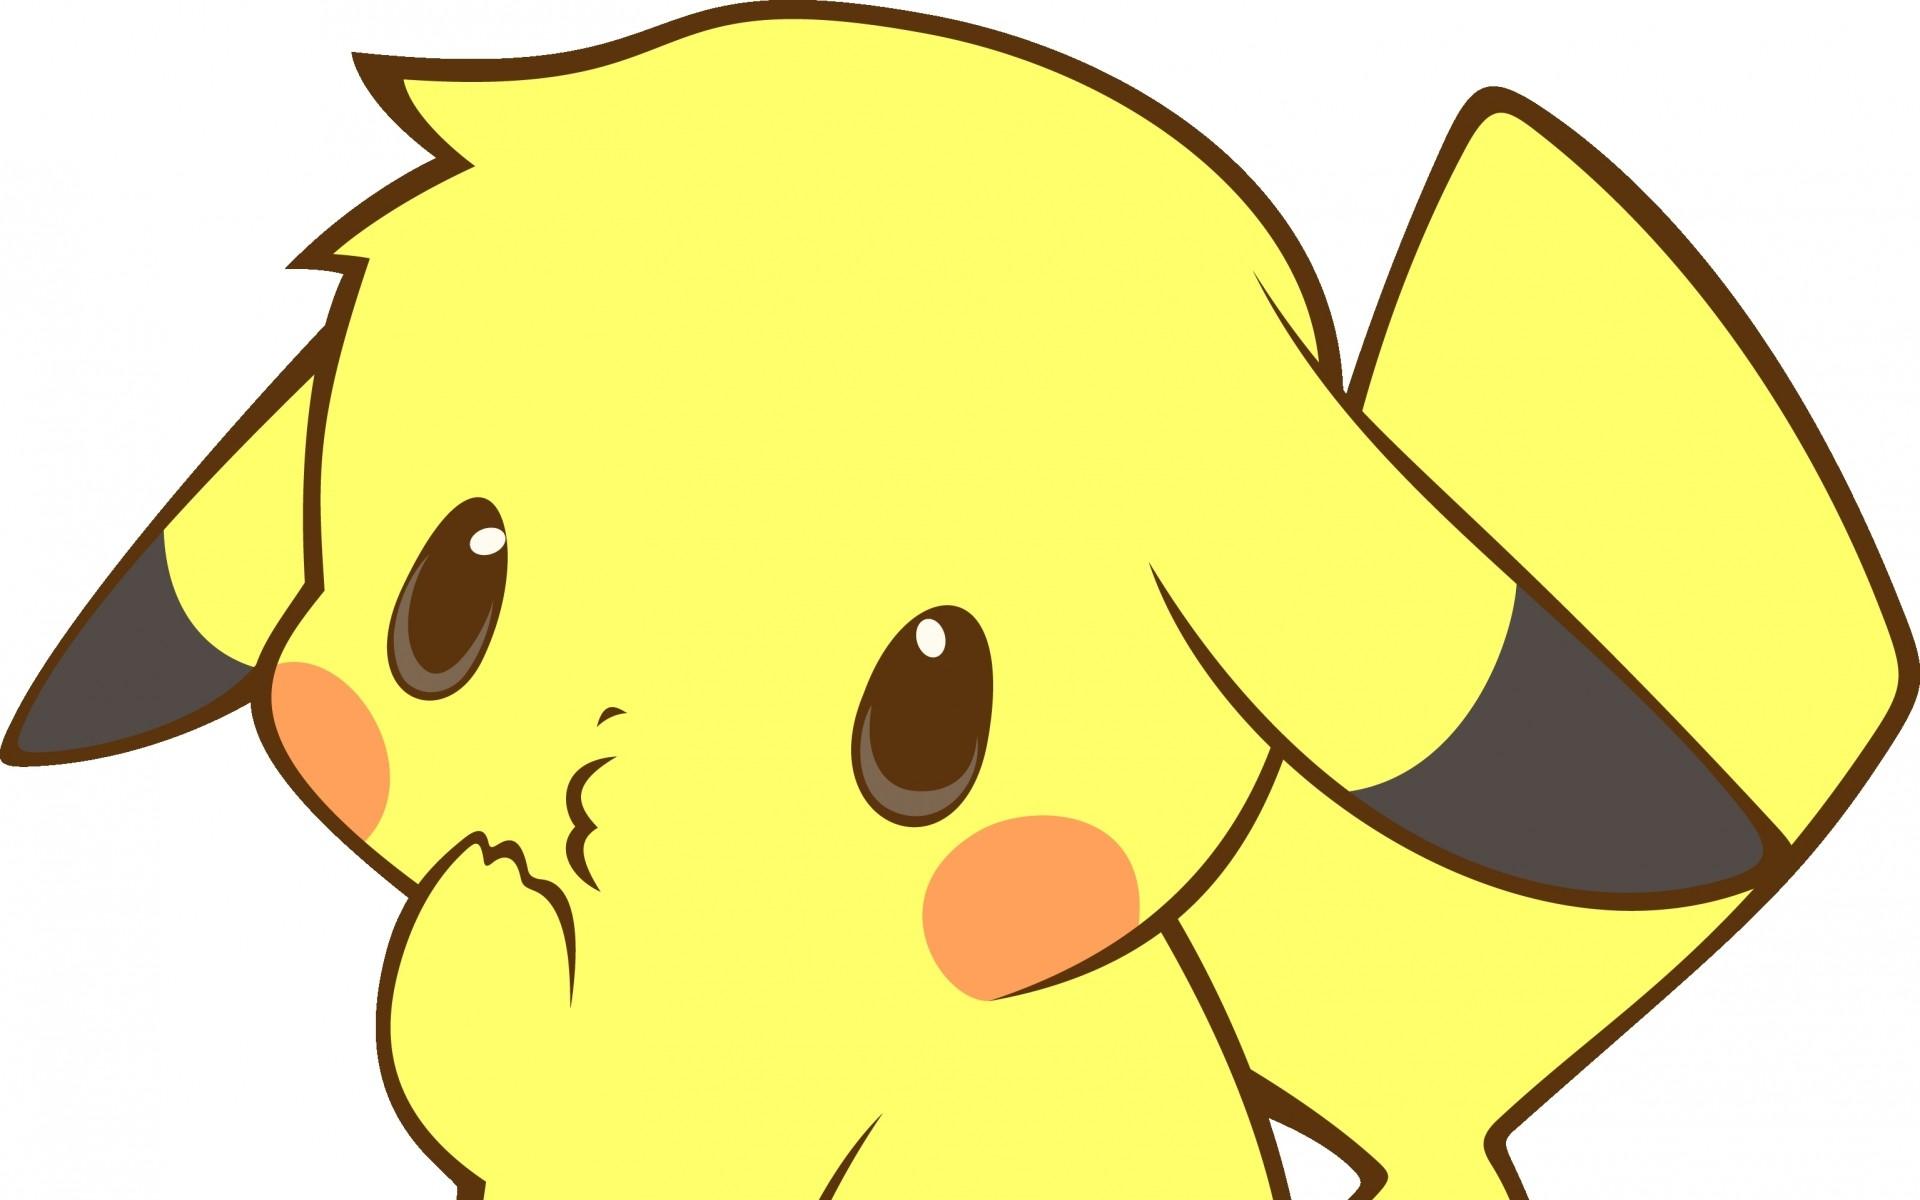 Pokemon Pikachu Kawaii wallpaper by henryjames | RevelWallpapers.net